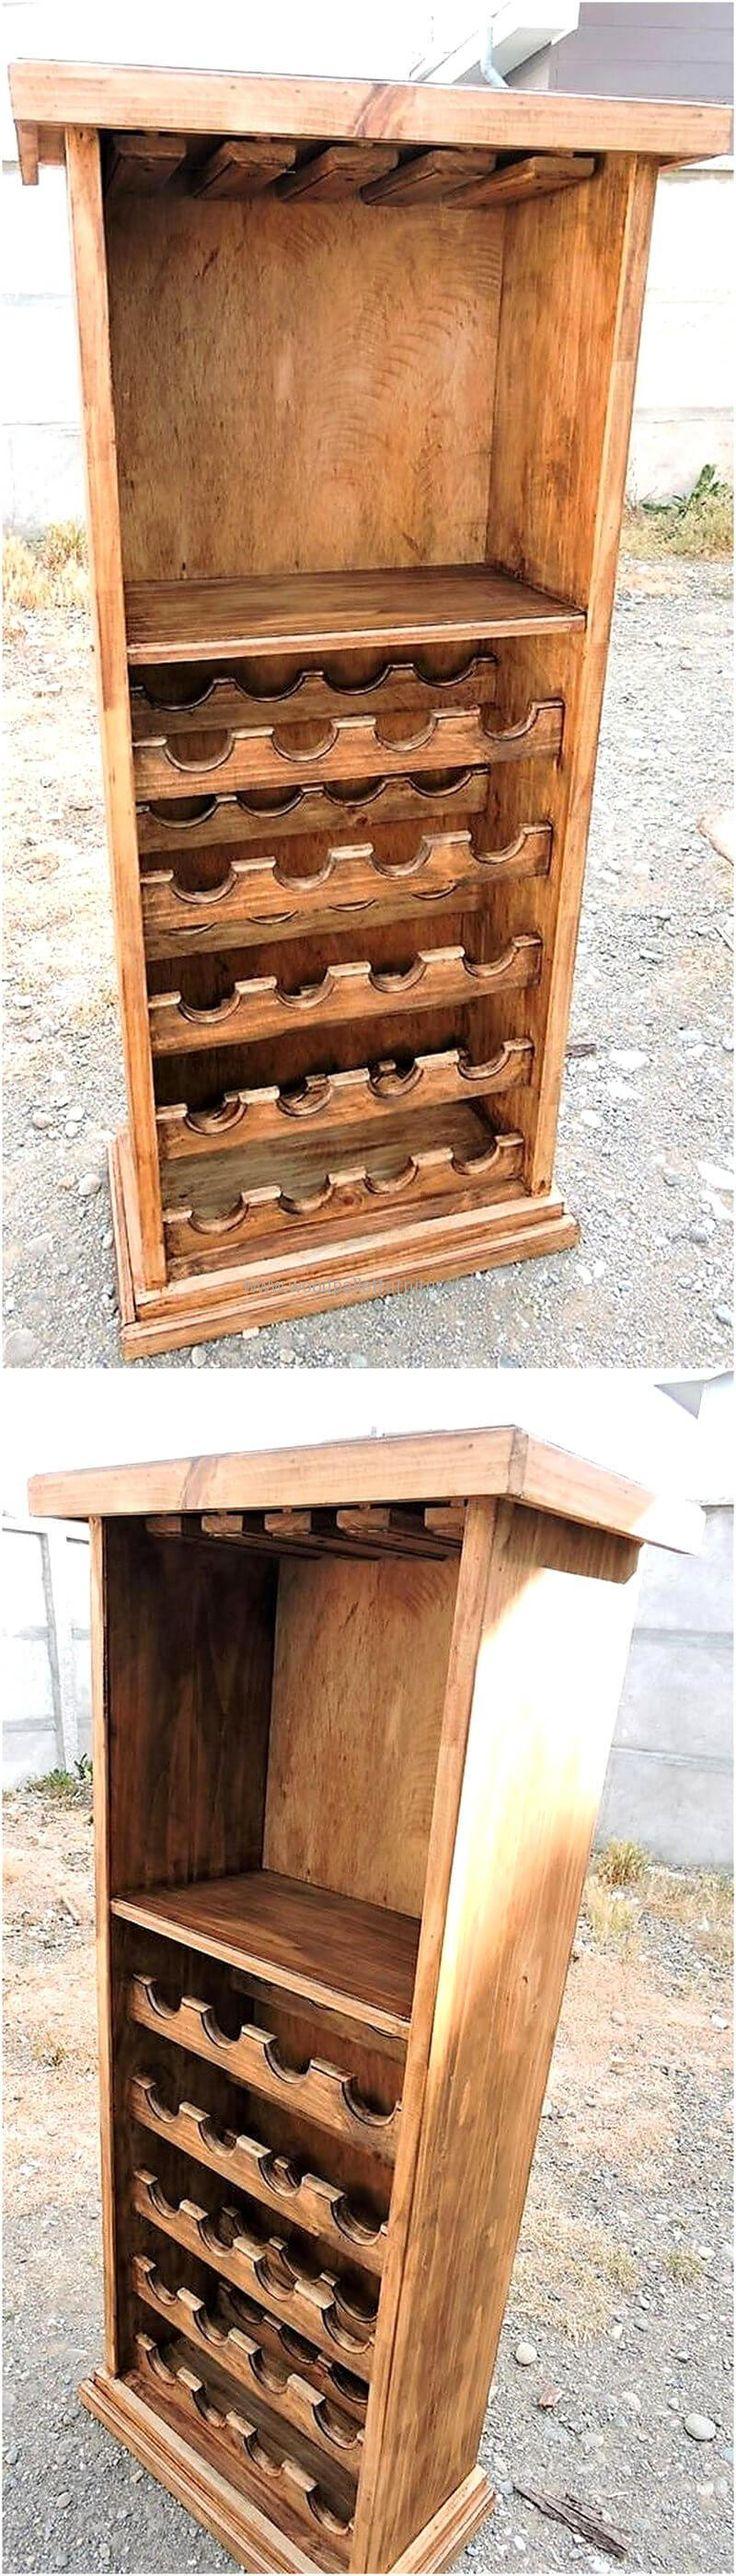 Lid german beer mug hinged lid gaming computer desk ideas - Creative Ways To Recycle And Reuse Wood Pallets